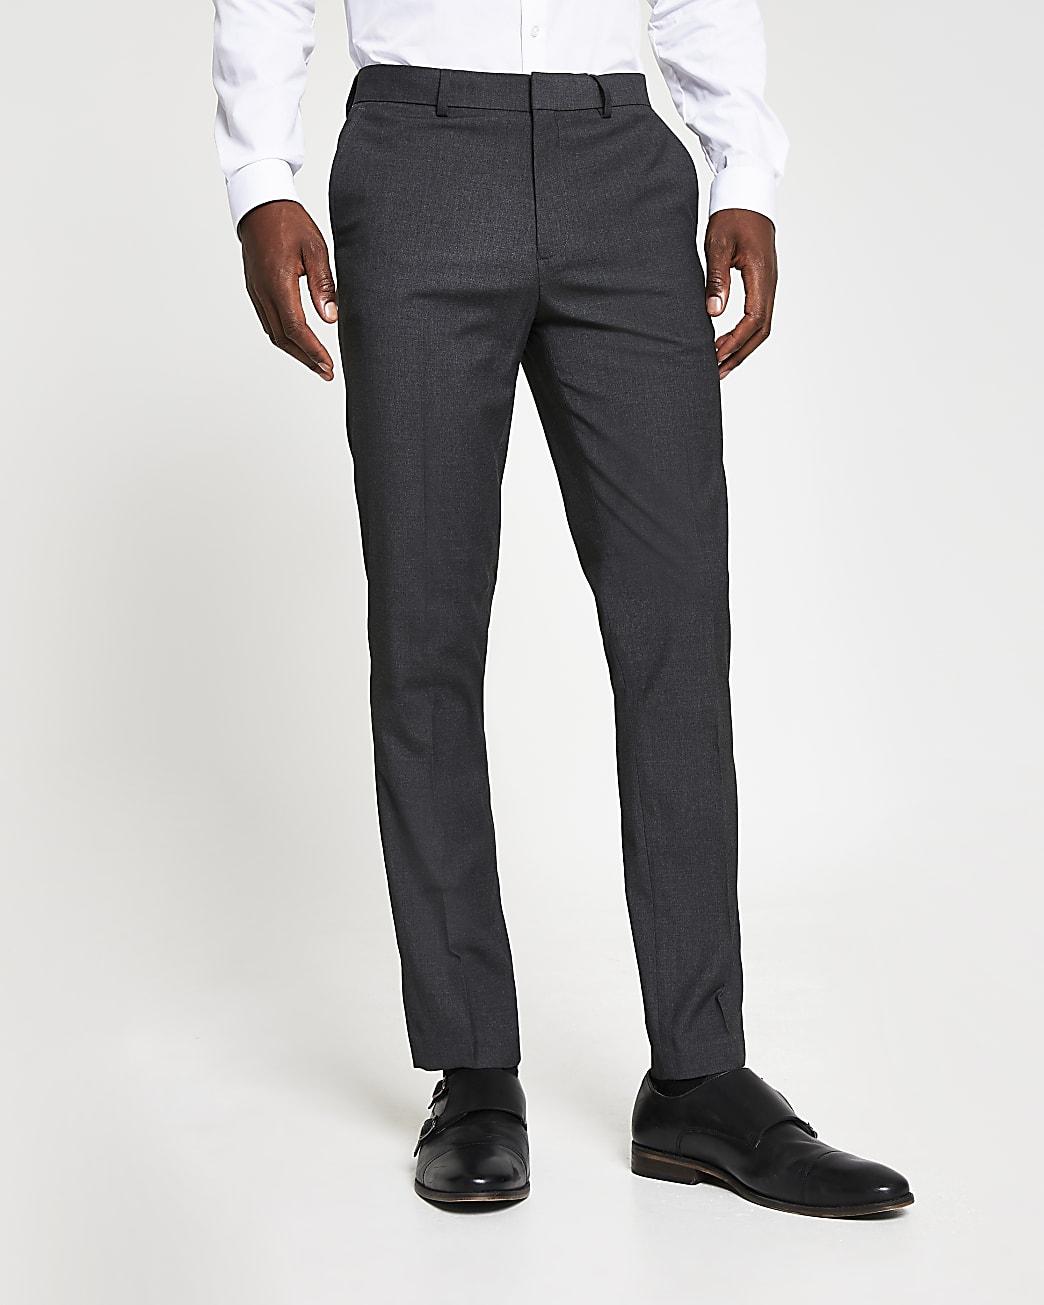 Dark grey skinny fit smart trousers